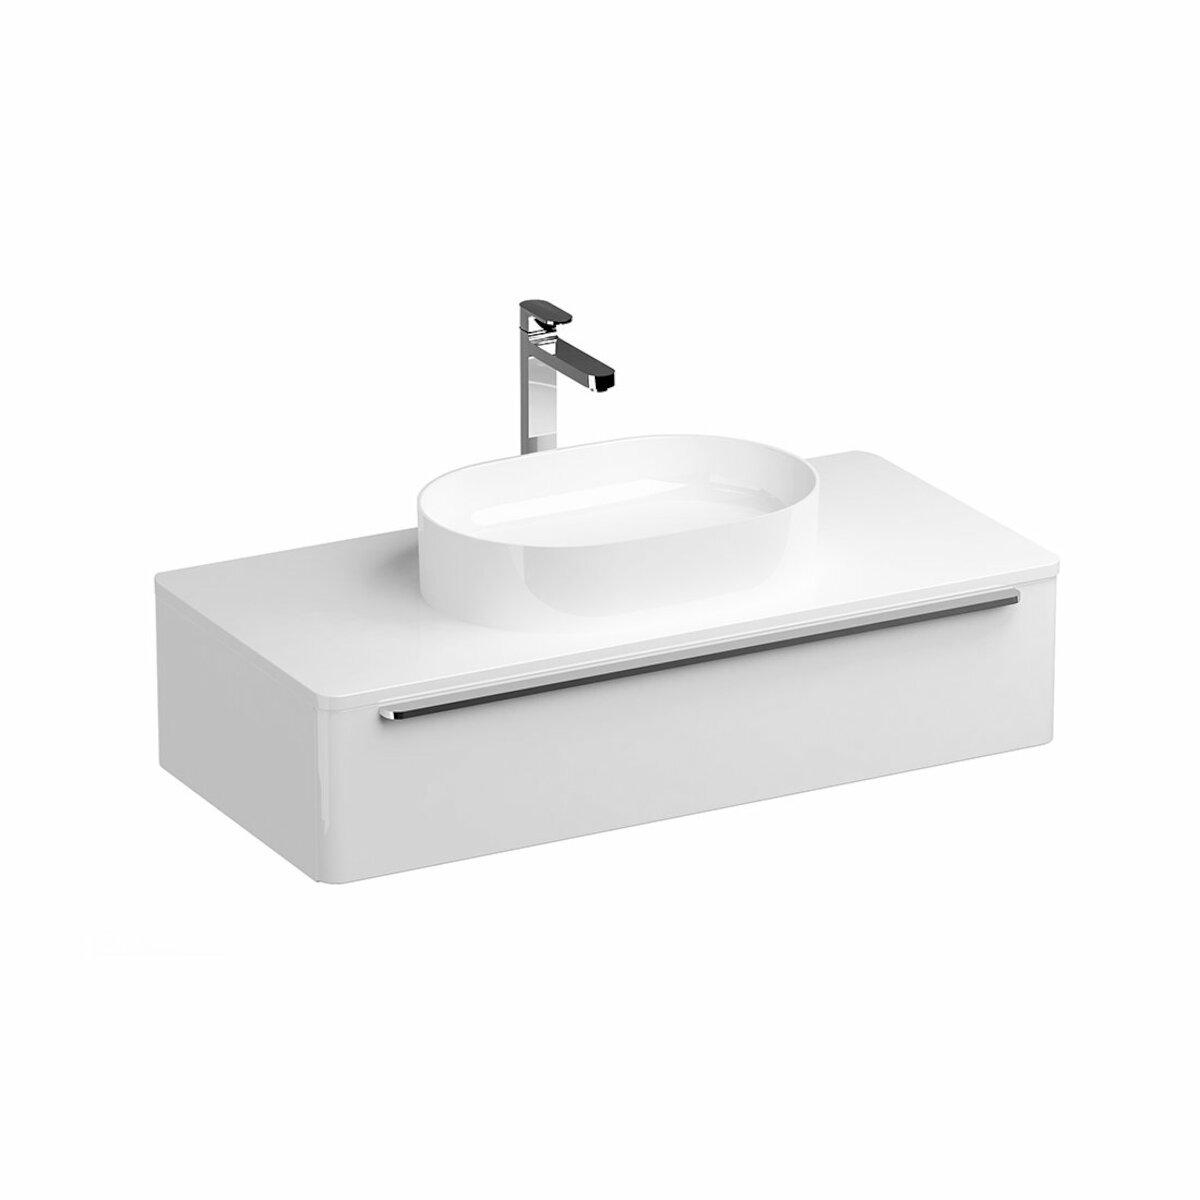 Kúpeľňová skrinka pod umývadlo Ravak SUD 110x53 cm biela X000001082